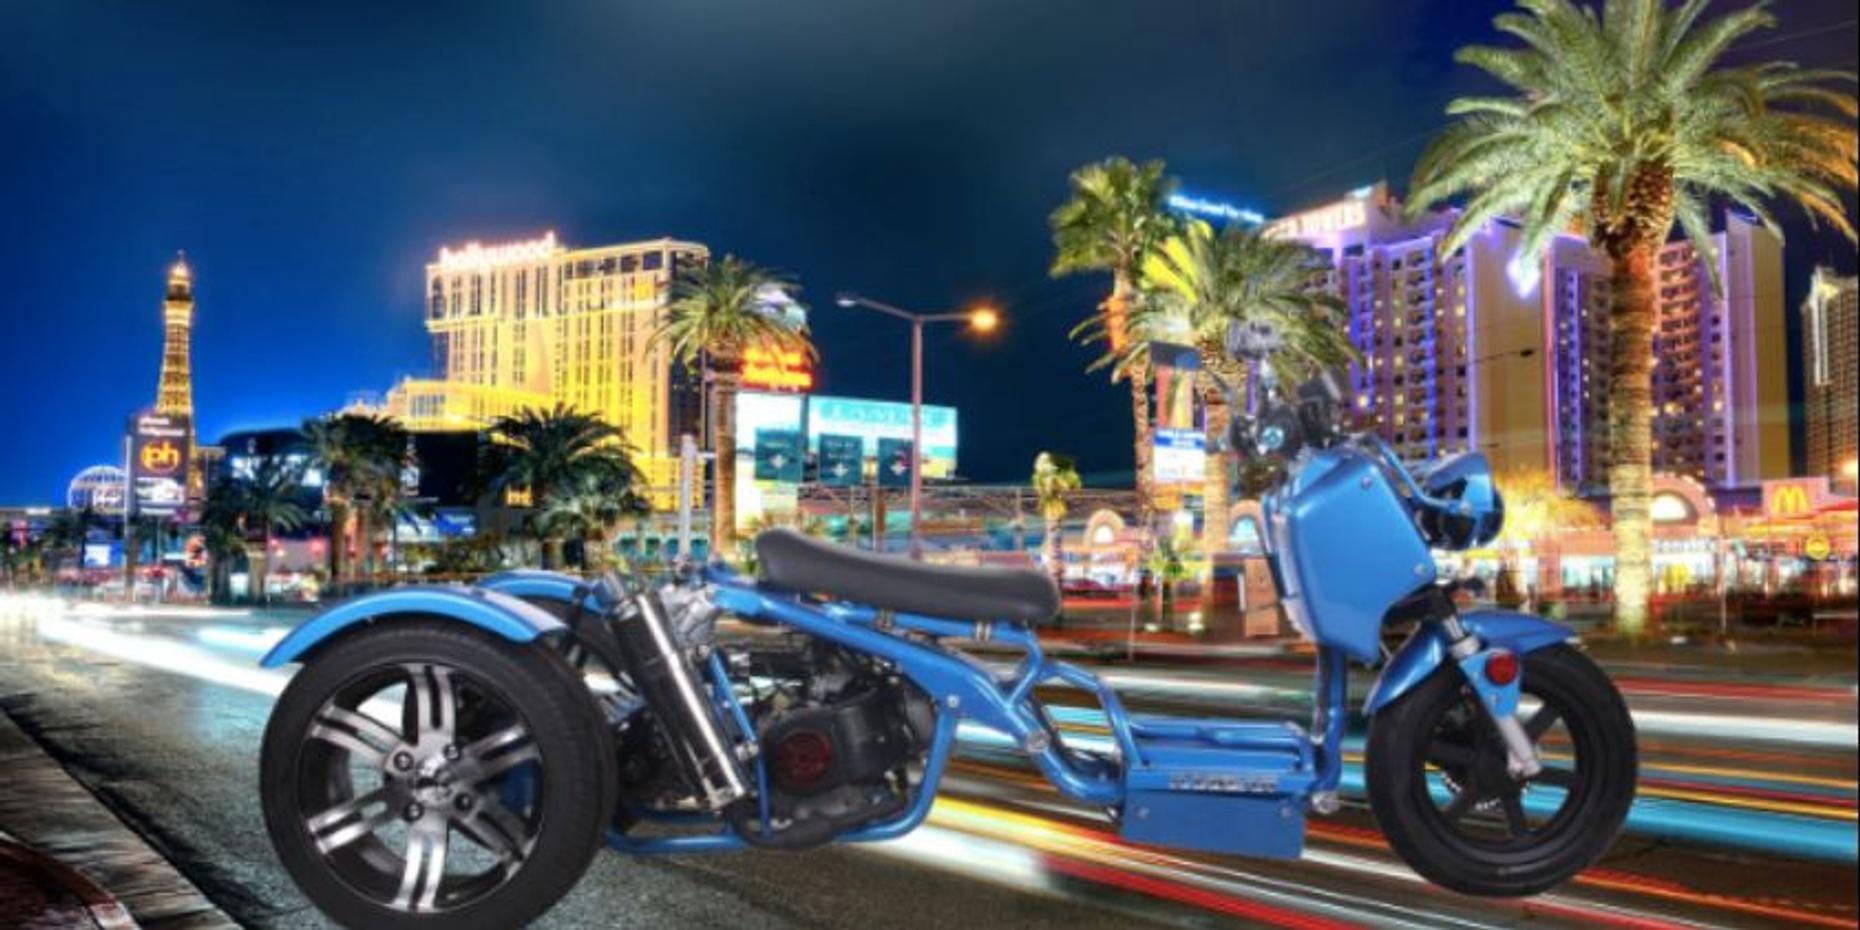 3-Hour Maddog 150cc Trike Rental in Las Vegas